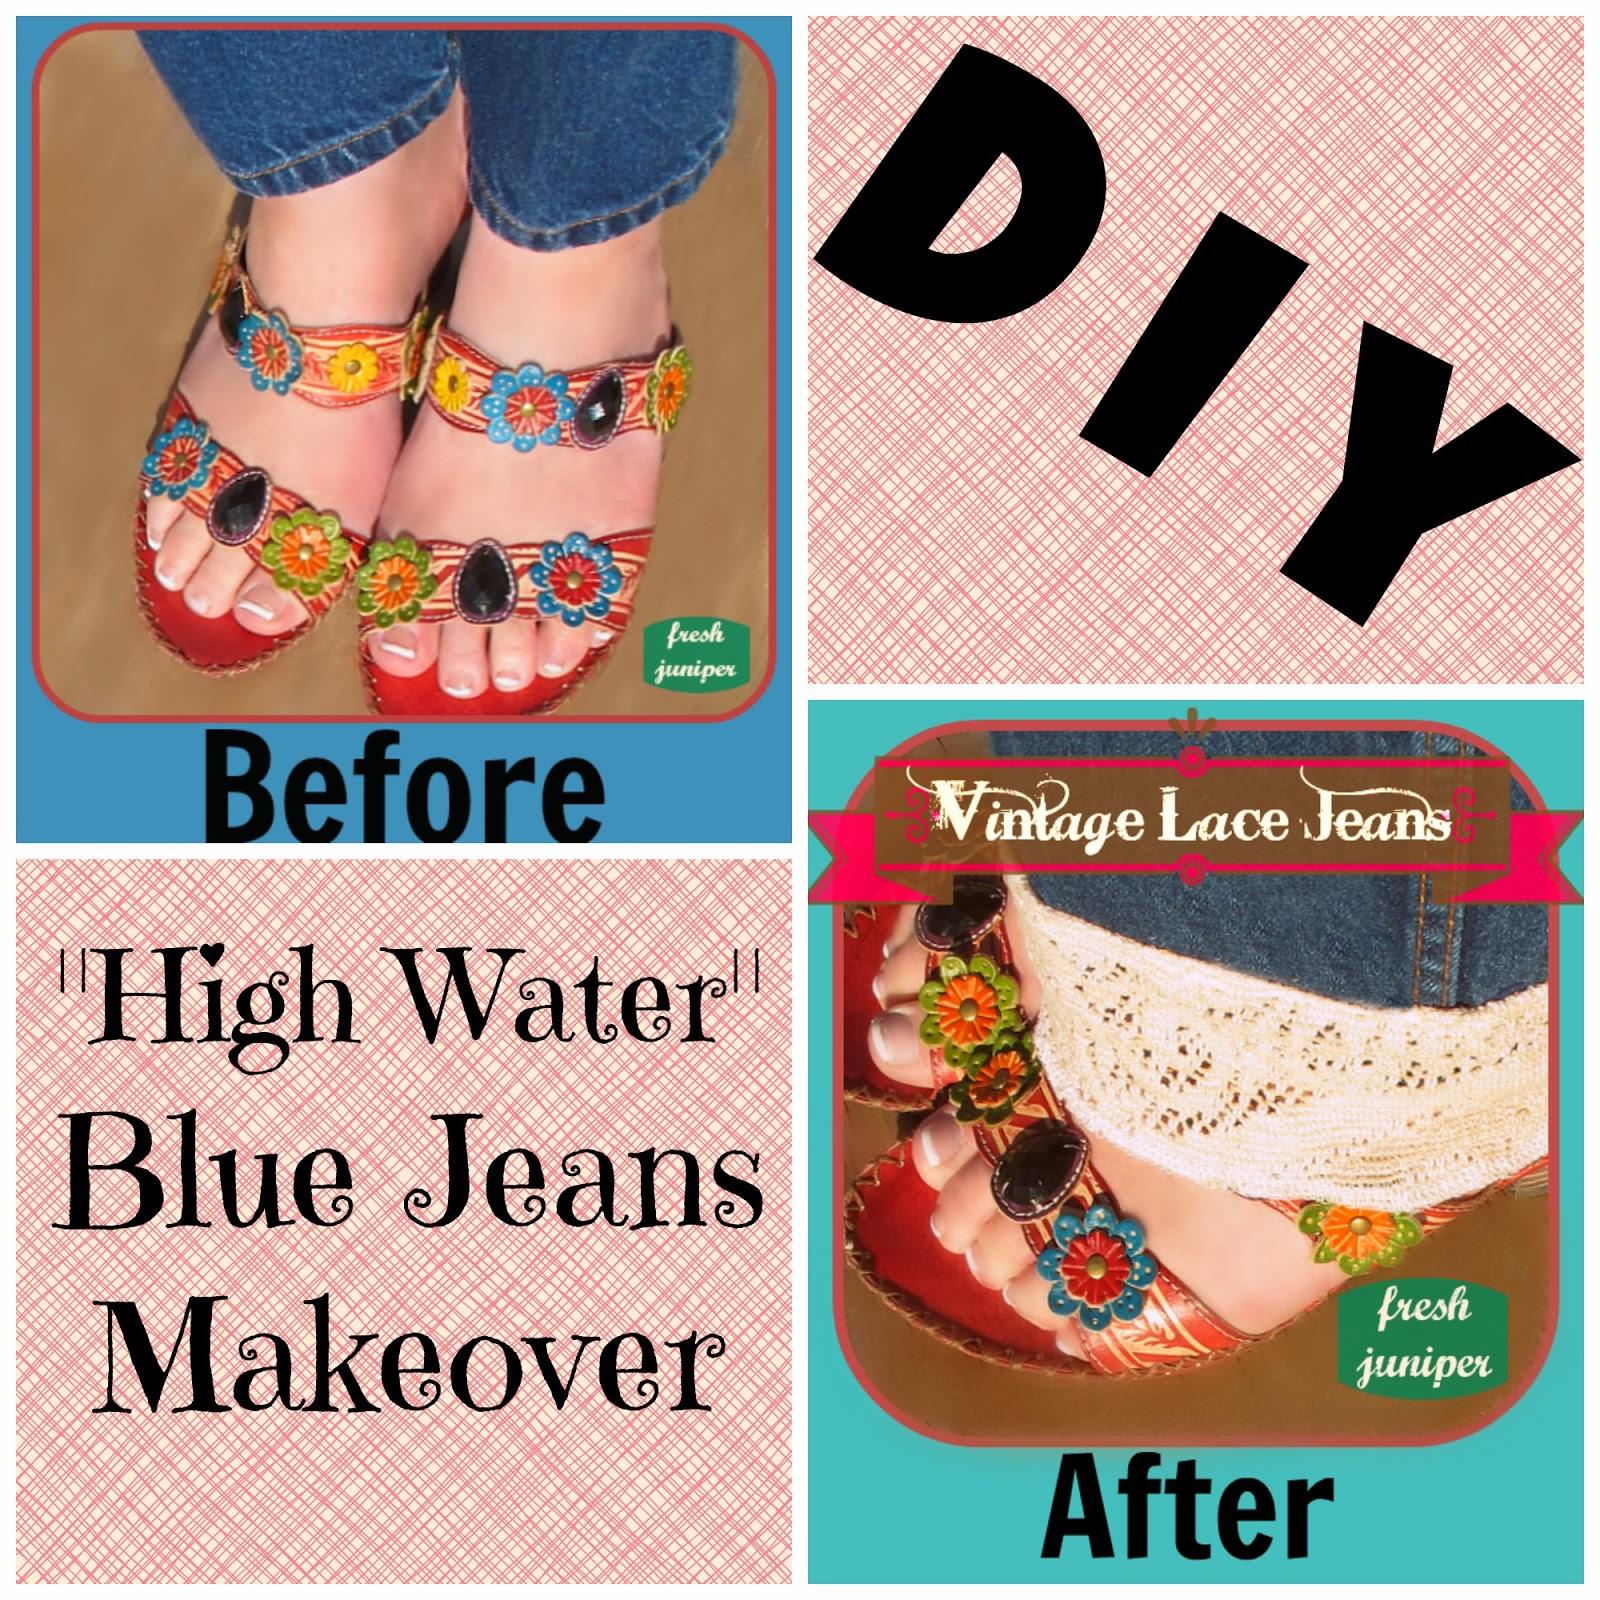 http://freshjuniper.blogspot.com/2014/02/vintage-lace-trim-jeans-tutorial-one.html